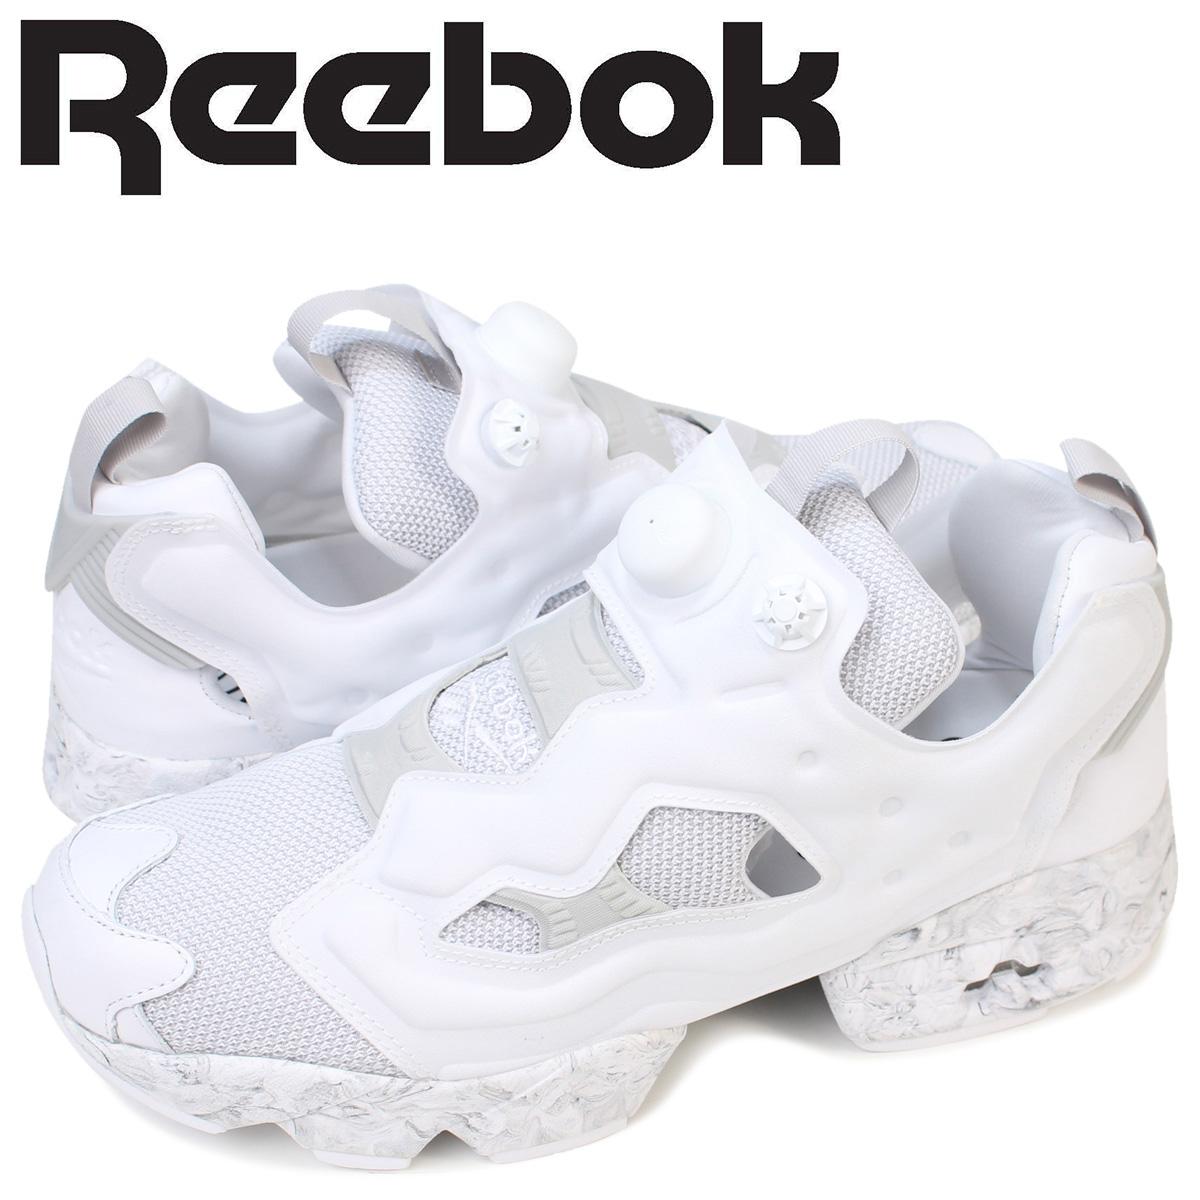 173912df1d4 ALLSPORTS  Reebok ポンプフューリースニーカーリーボック INSTA PUMP FURY ACHM BD1550 men shoes  white  4 17 Shinnyu load   174